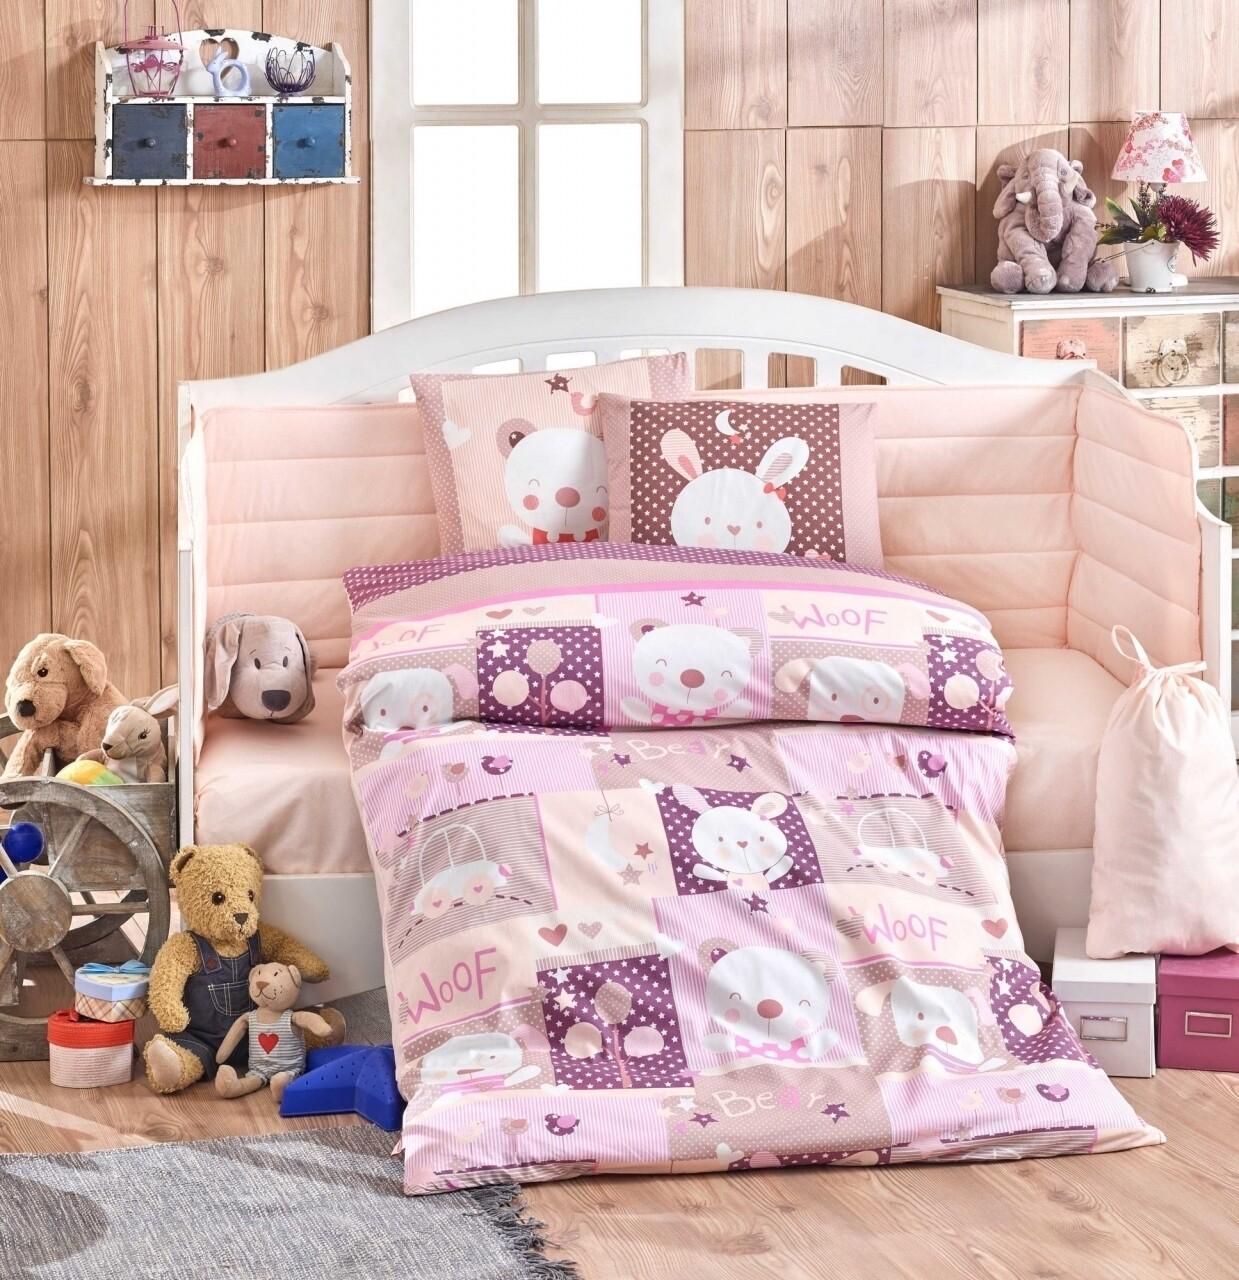 Lenjerie de pat pentru copii, 4 piese, 100% bumbac poplin, Hobby, Snoopy, roz